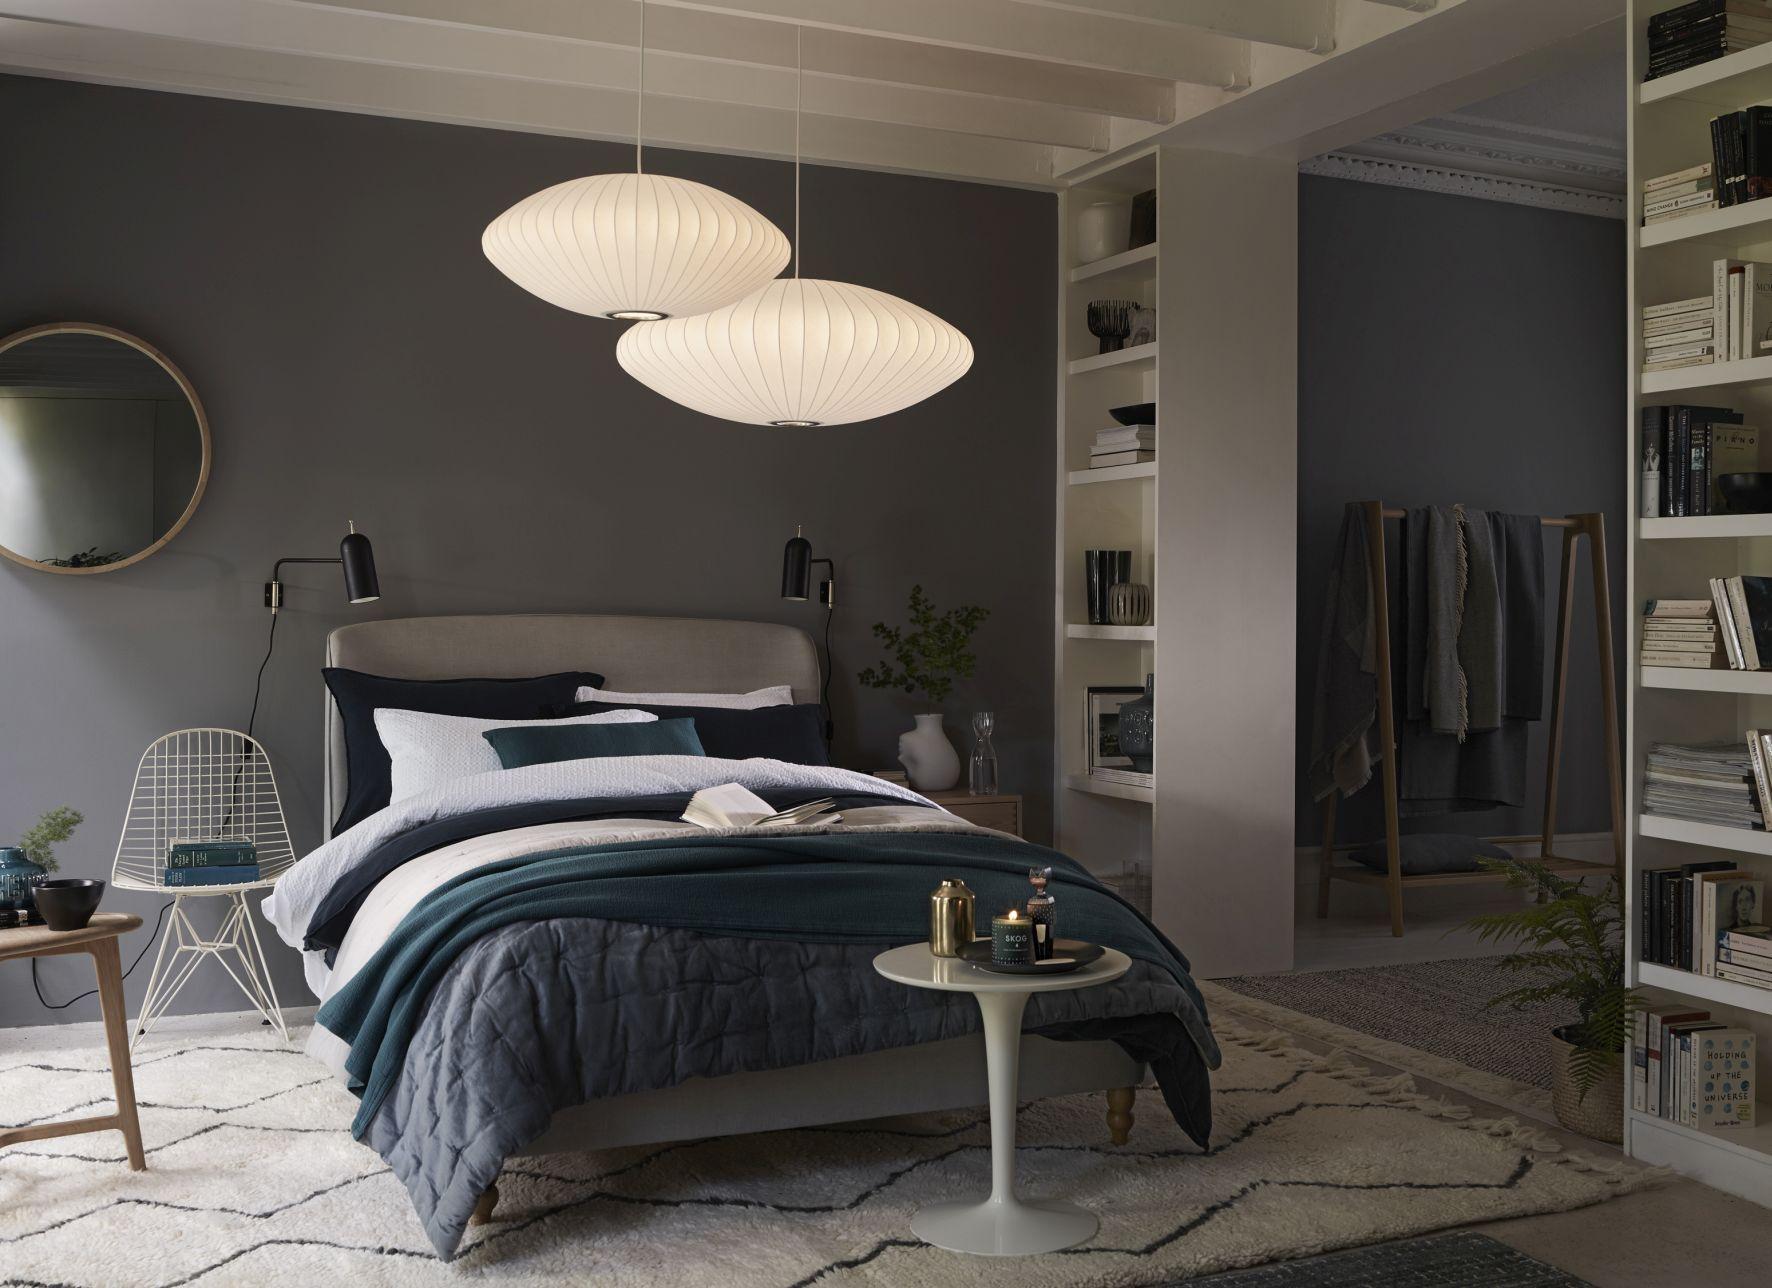 235cc39993e 12 Master Bedroom Ideas - Bedroom Decor Ideas